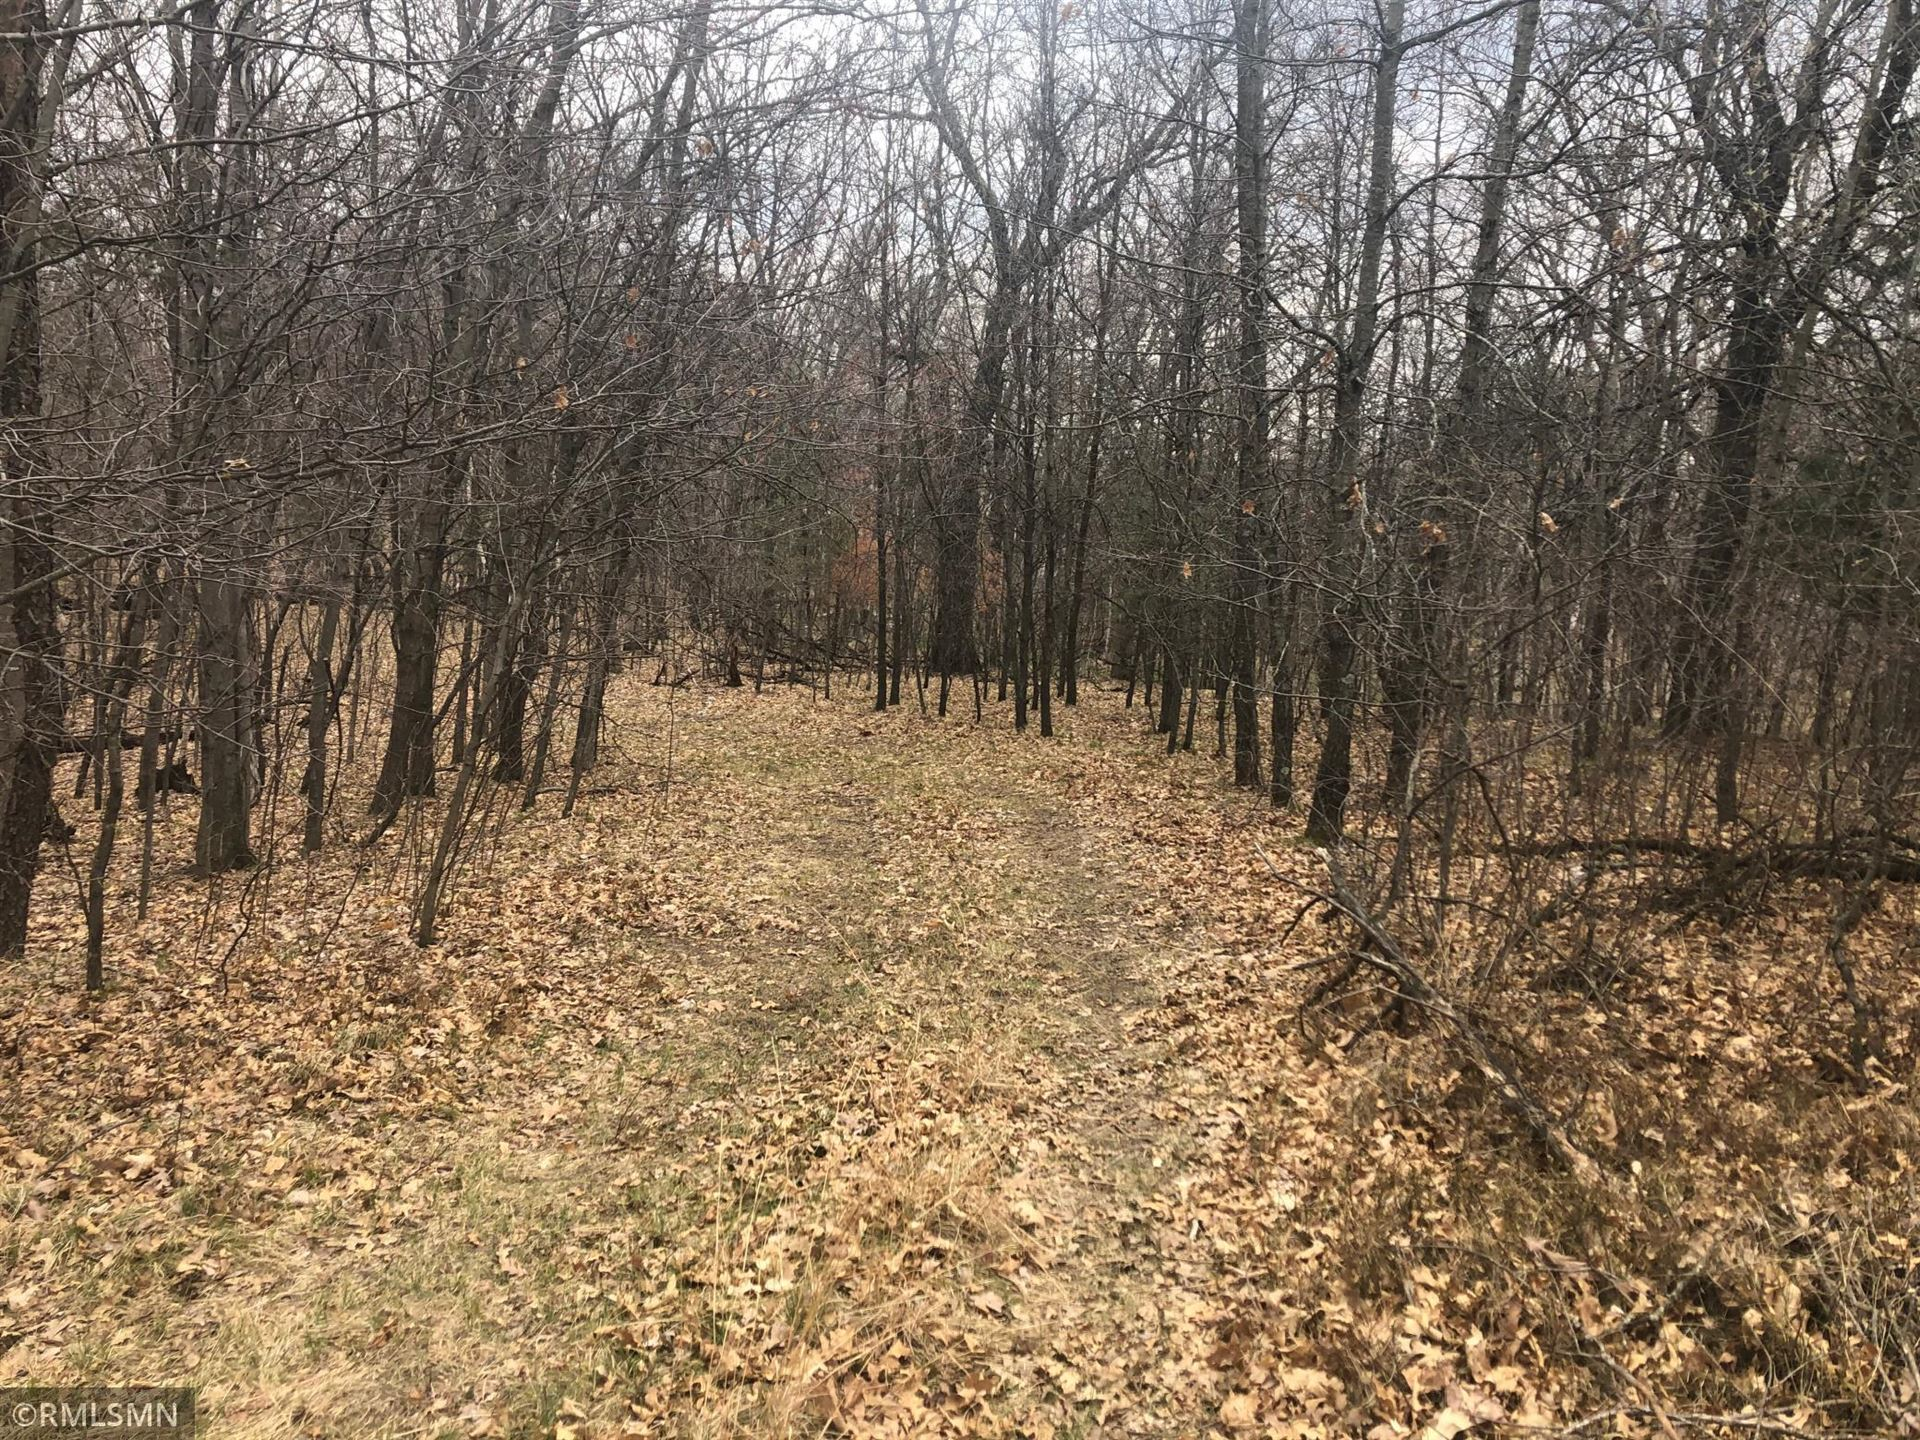 Photo of Lot 7 Typo Creek Drive NE, Linwood Township, MN 55079 (MLS # 5743227)